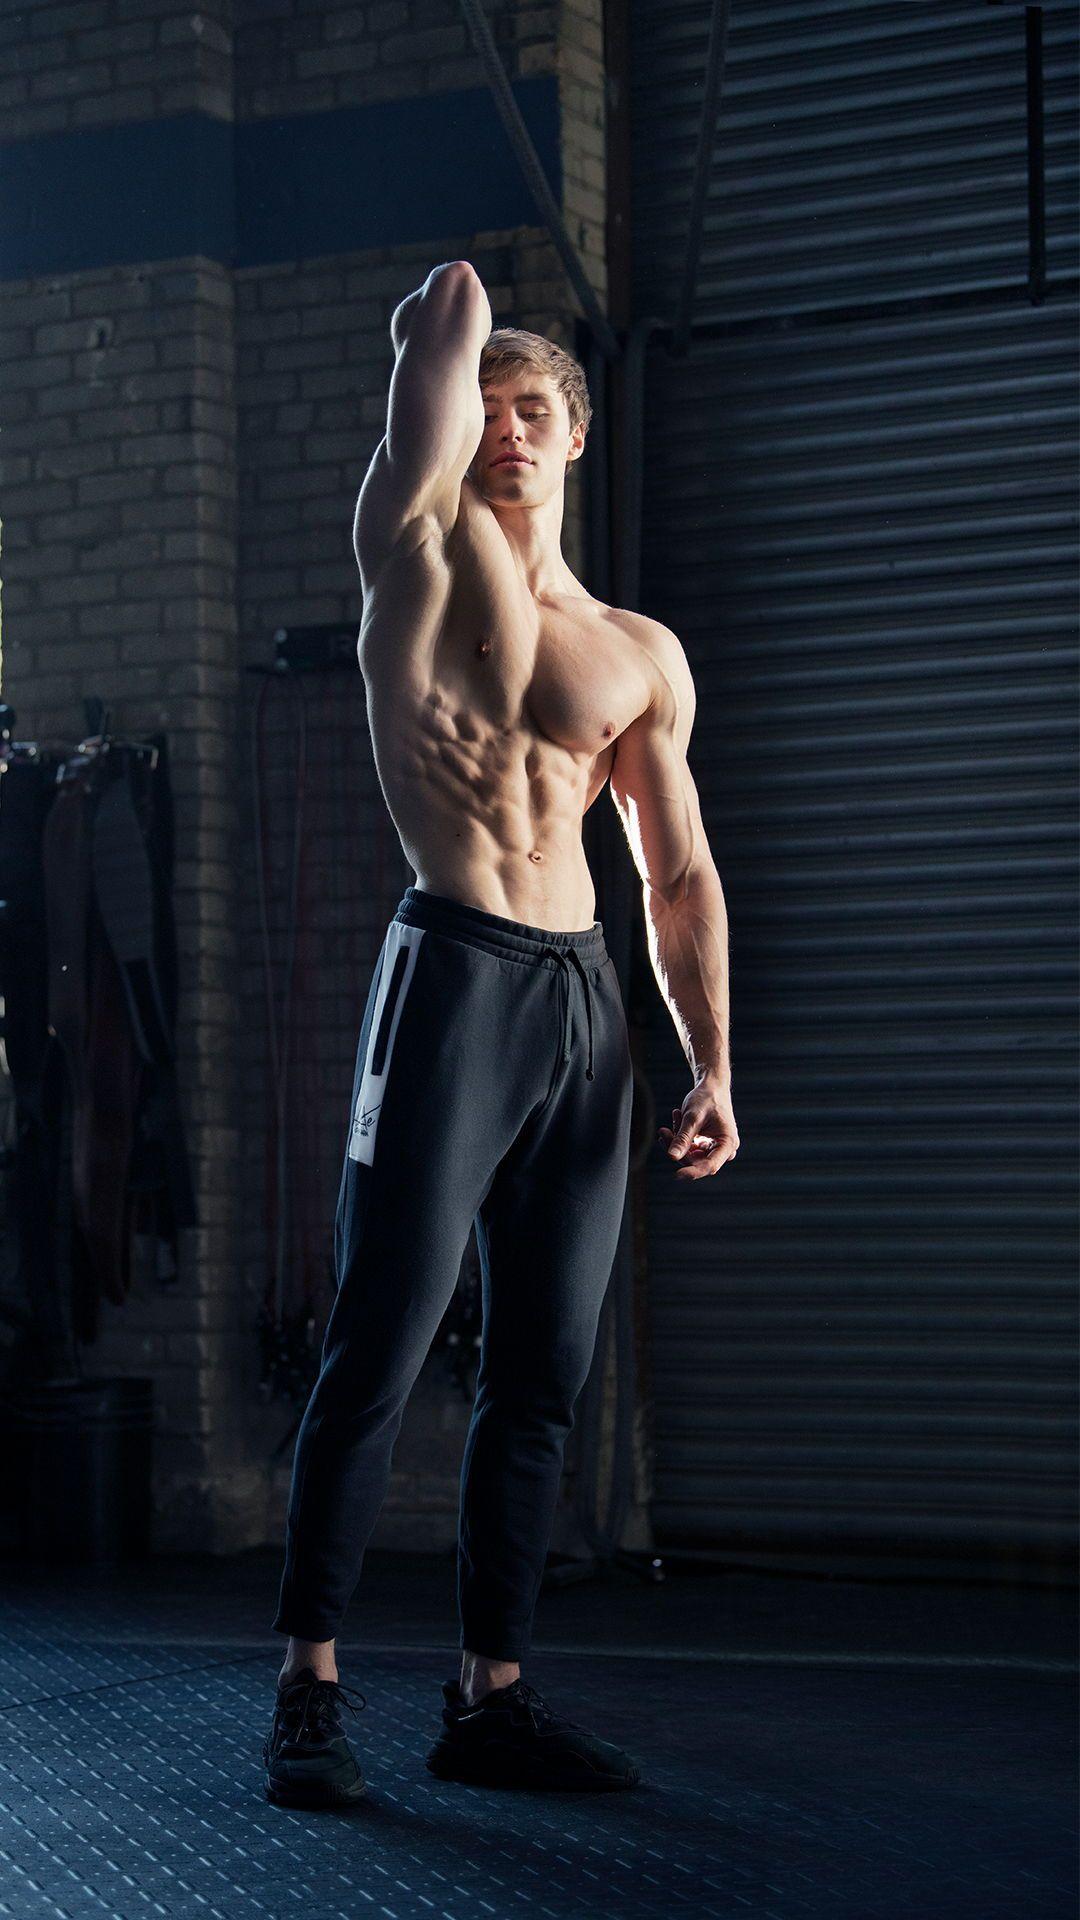 Gymshark Bodybuilding Gym Wear Men Bodybuilding Clothing Fitness Body